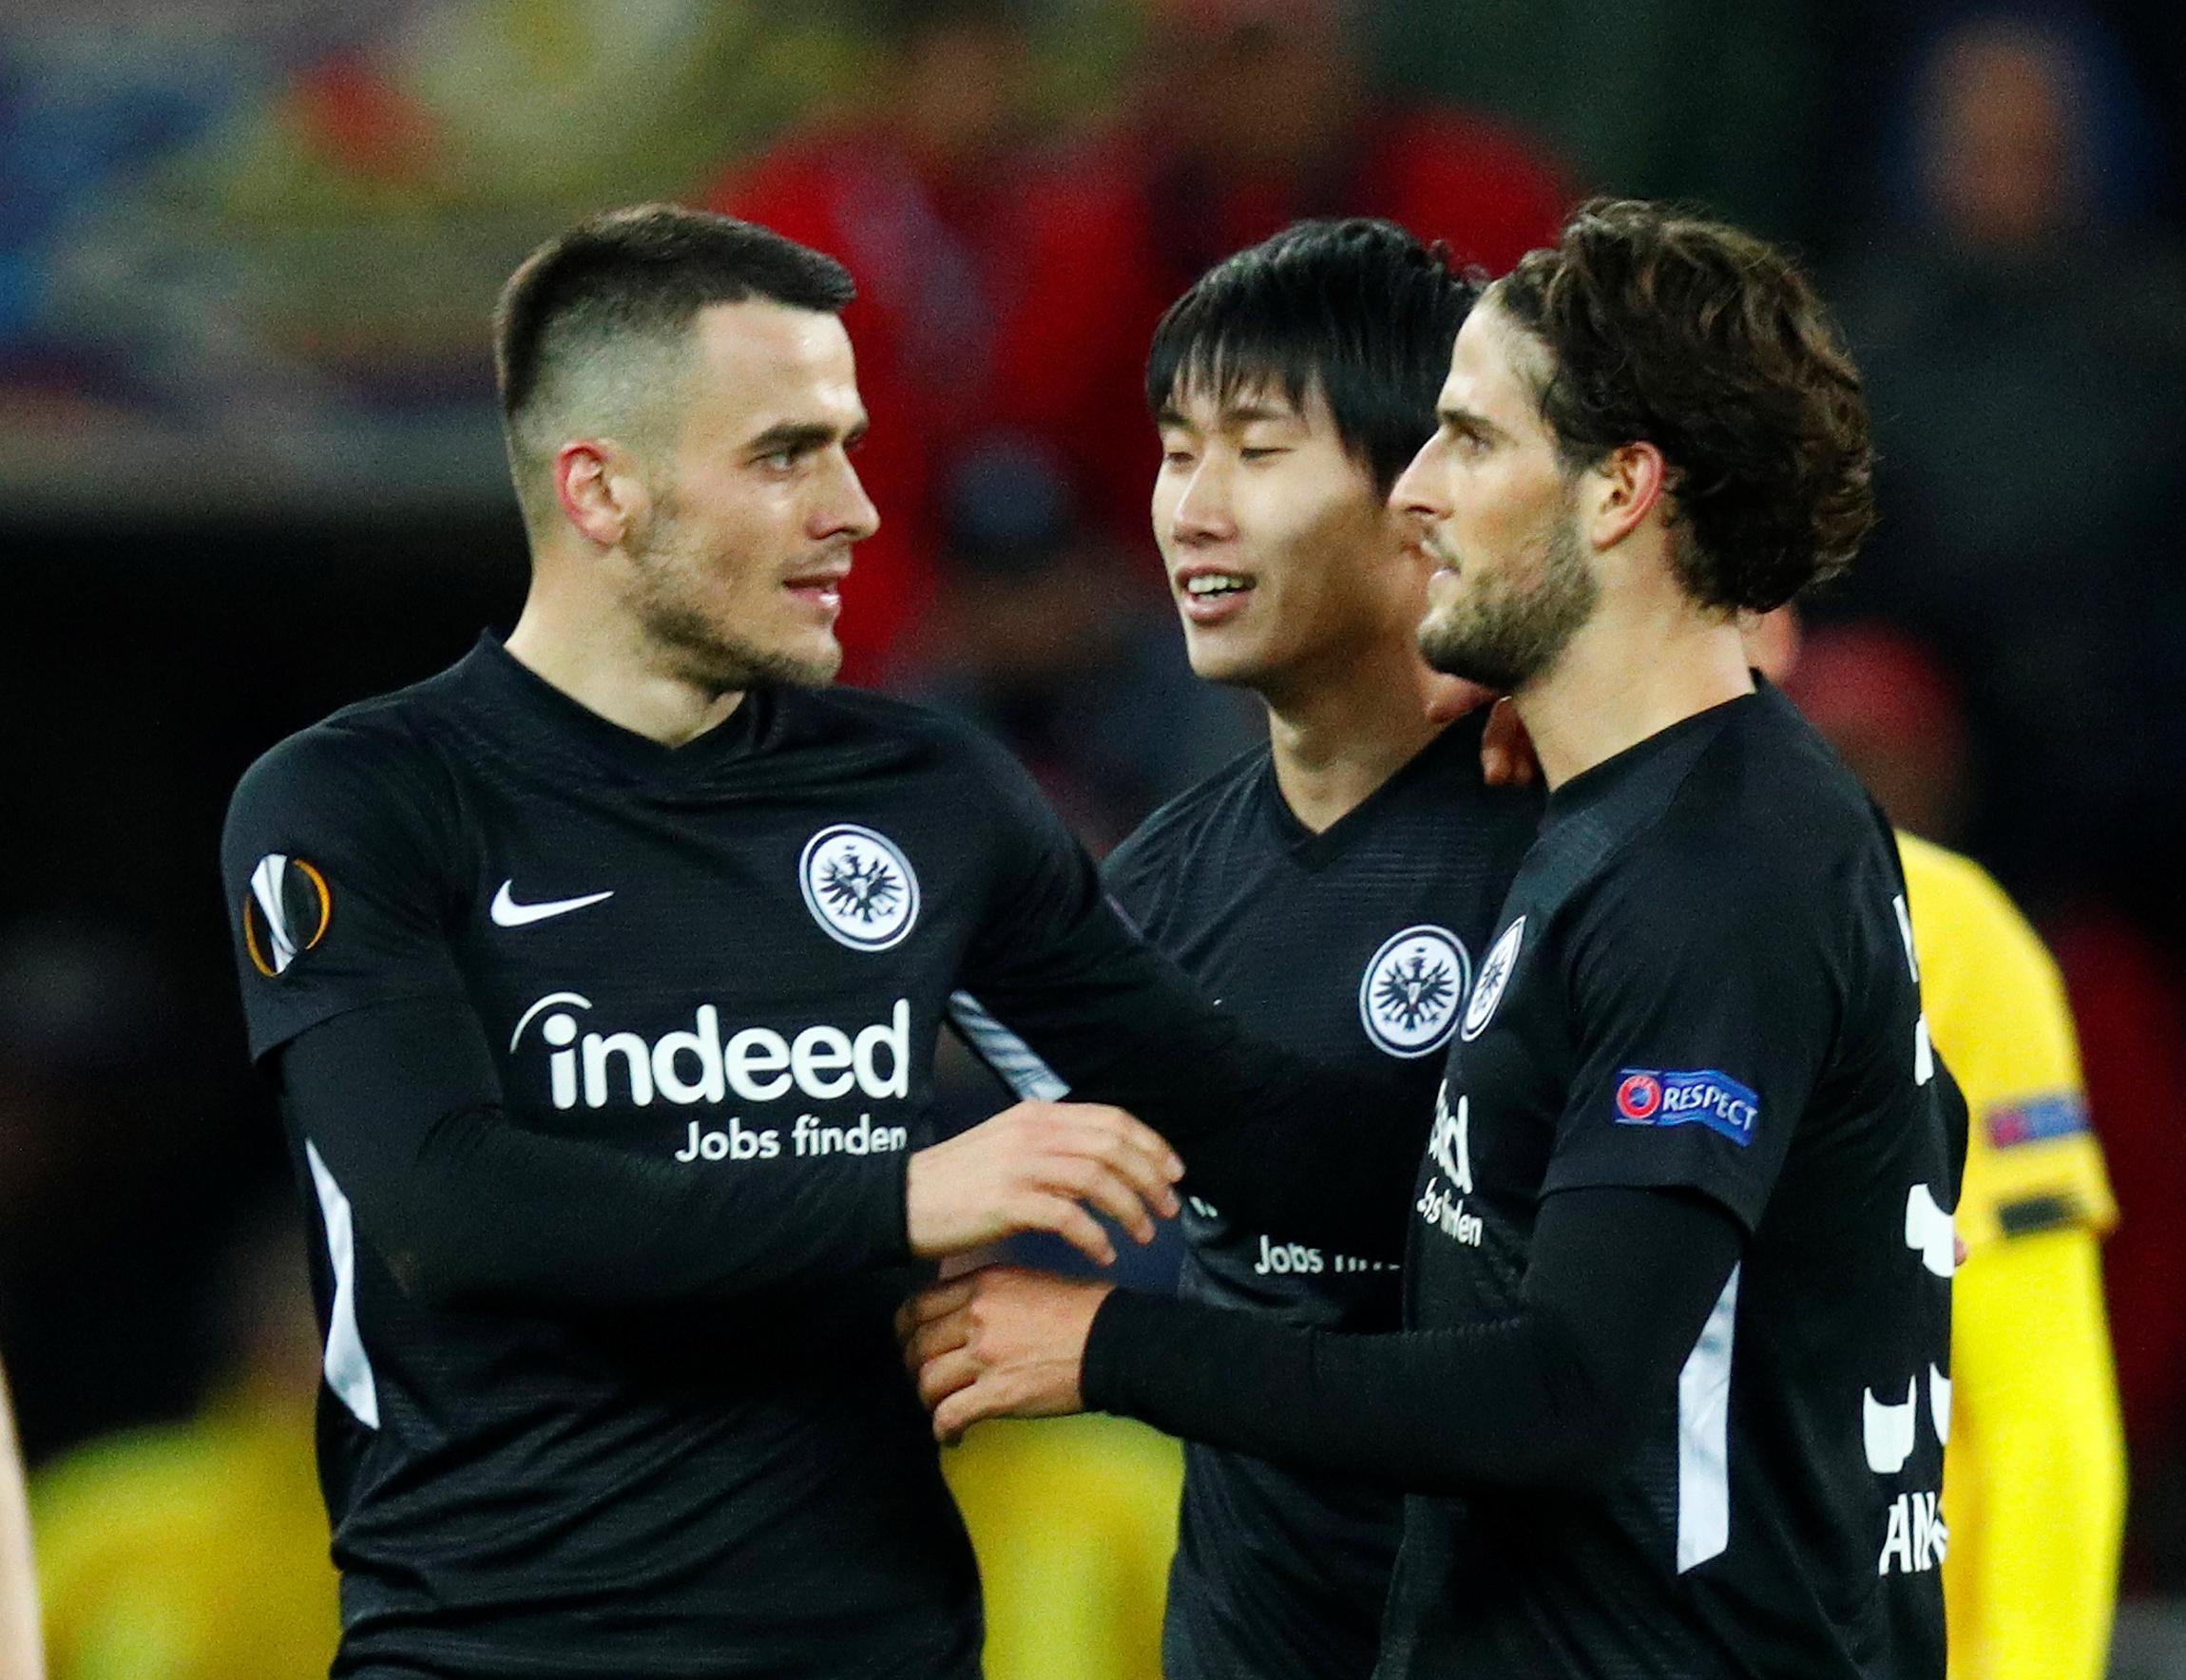 Frankfurt lose appeal against fan ban for Arsenal match